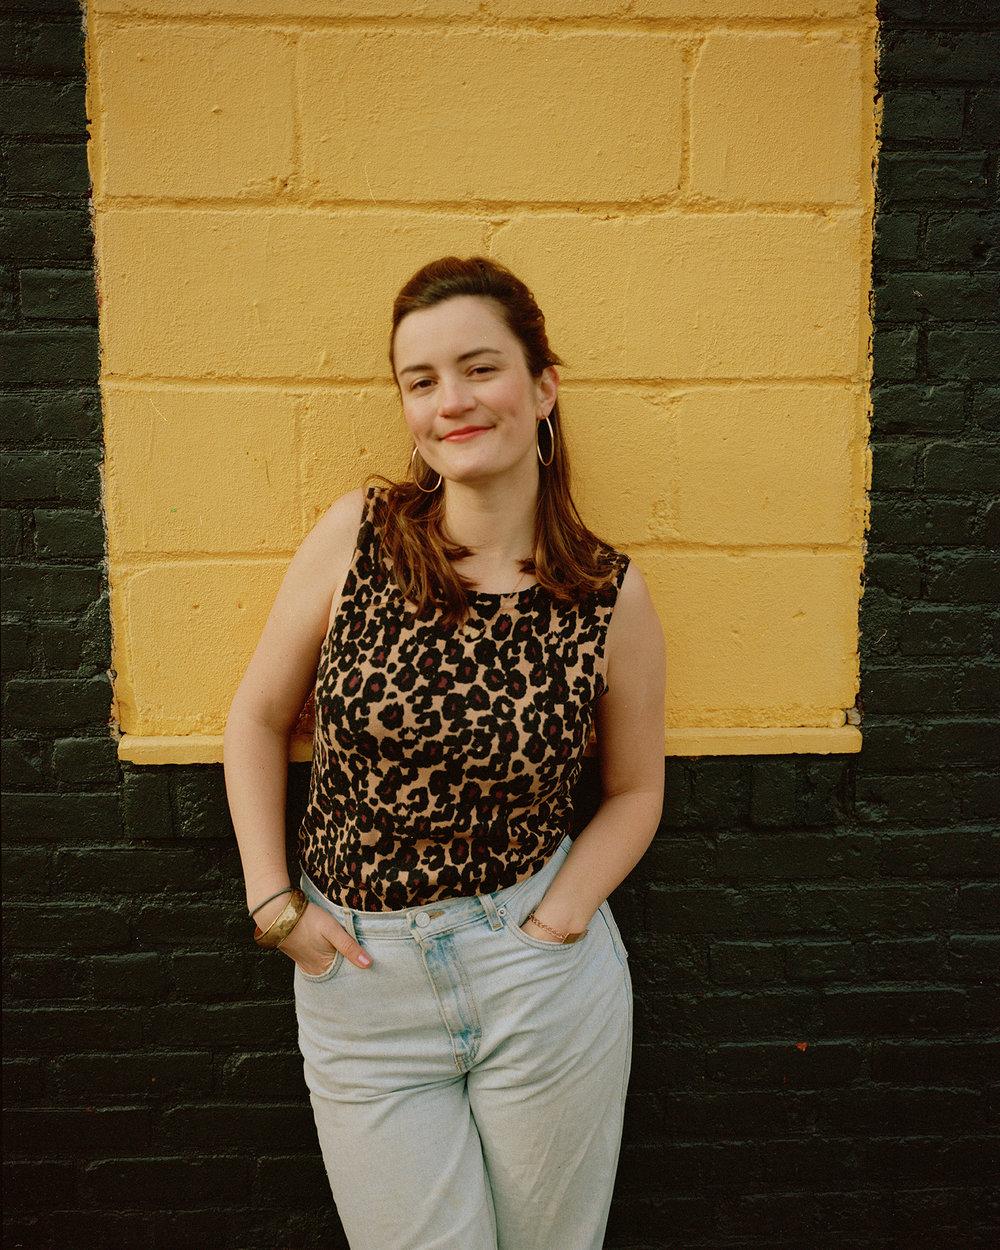 Kady Ruth Ashcraft